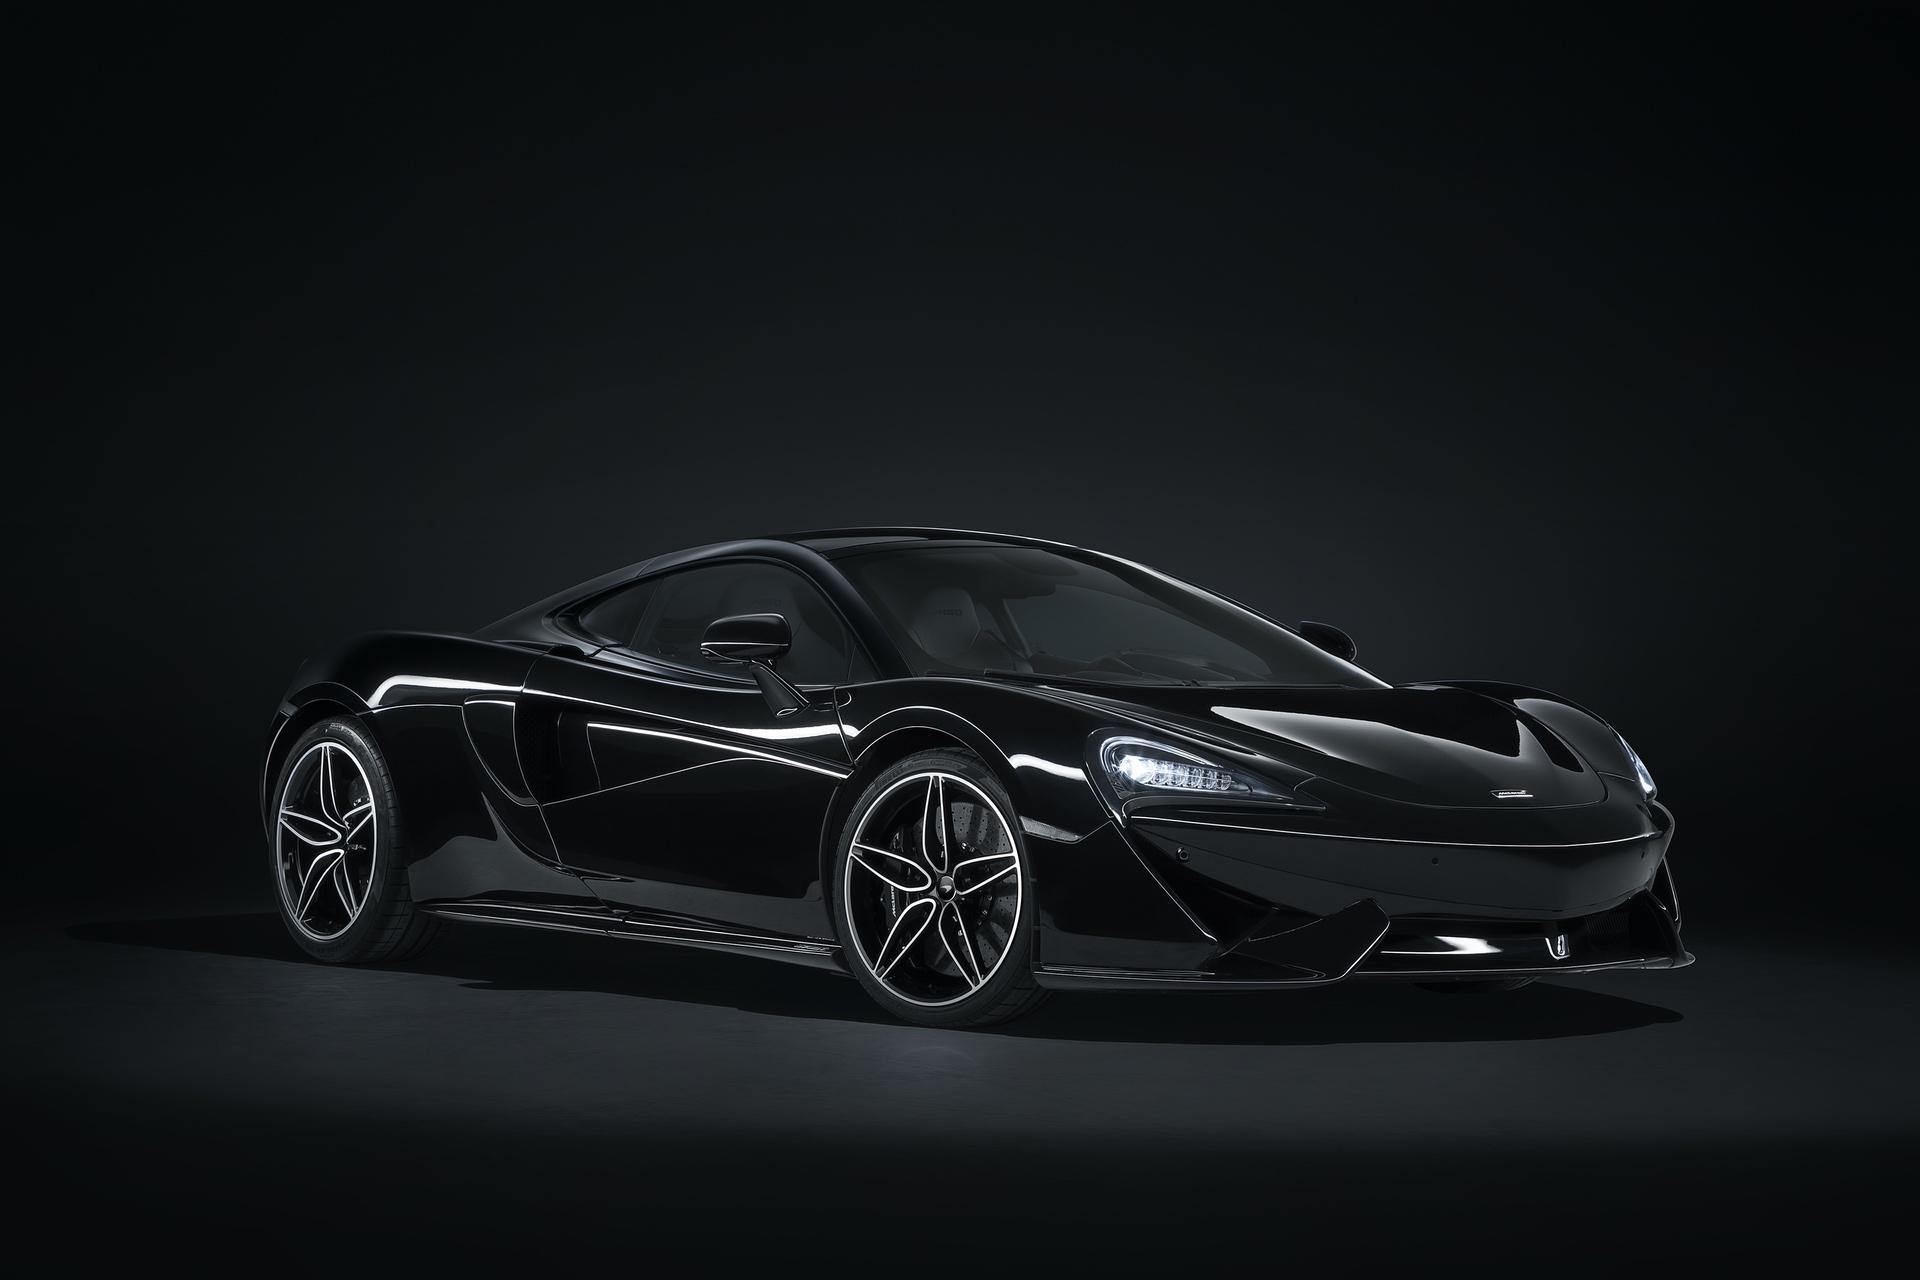 McLaren_570GT_MSO_Black_Collection_0003